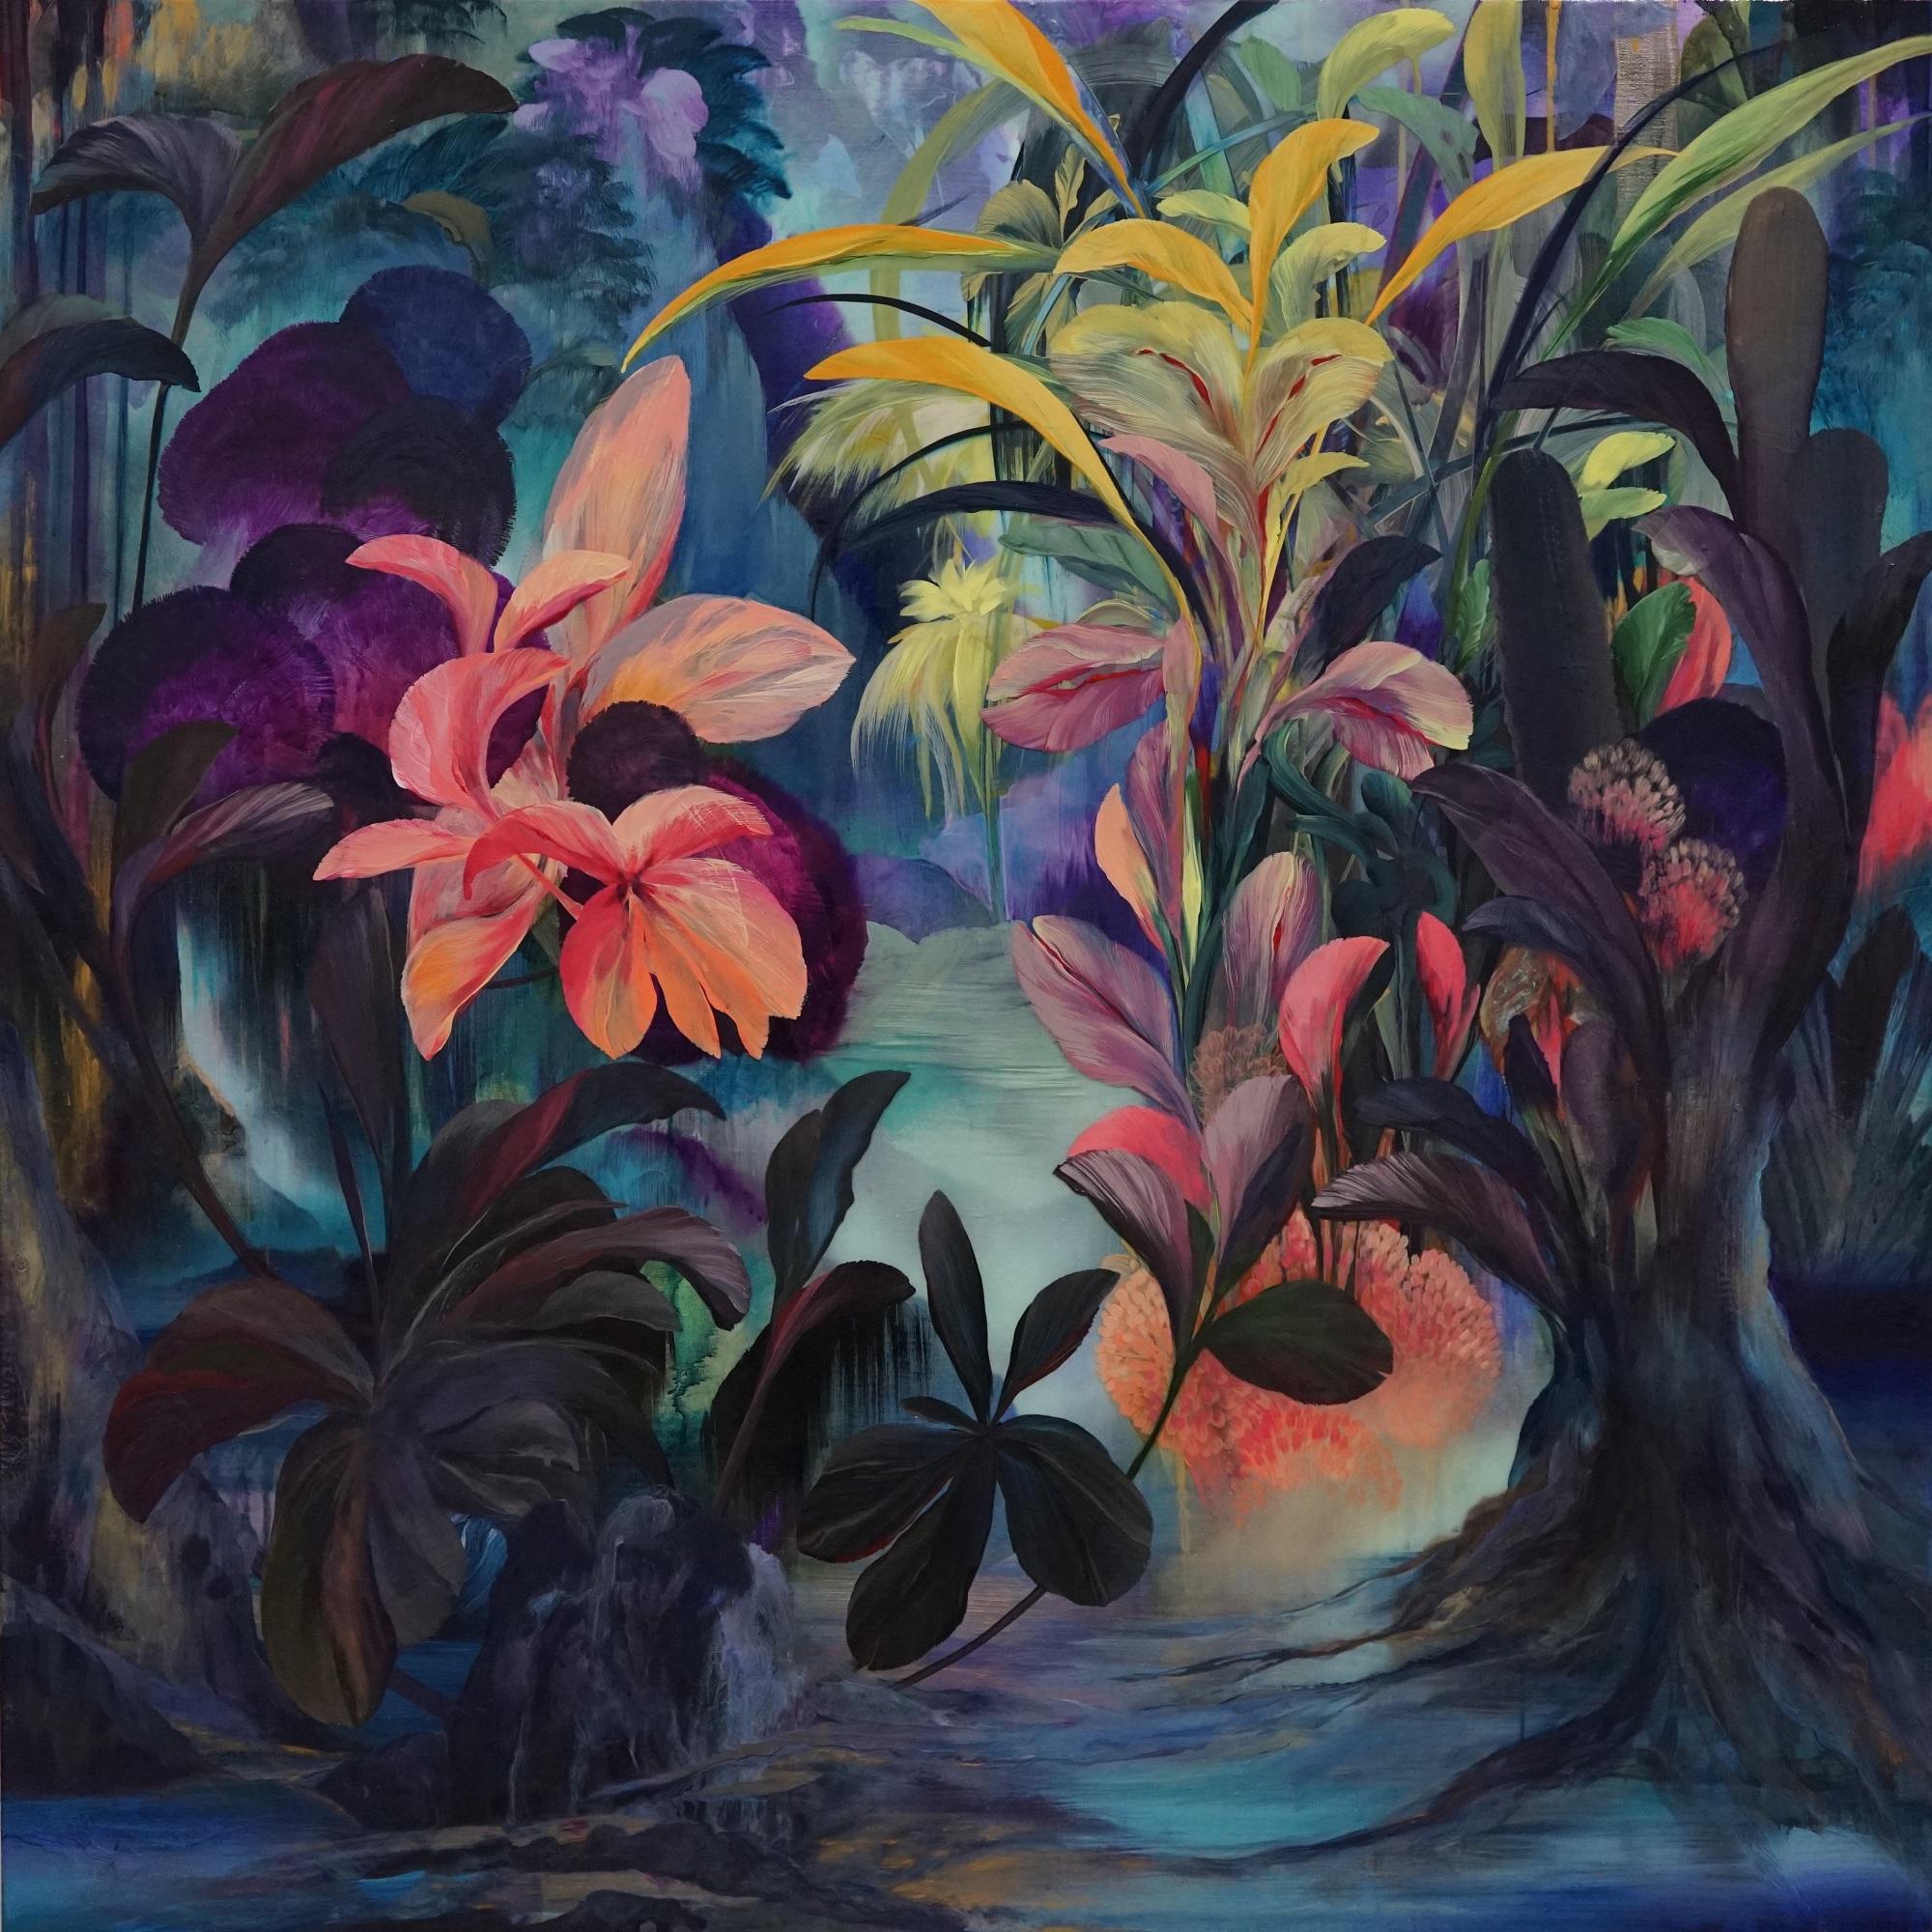 'Gate Keepers' Orlanda Broom Oil on canvas, 100cm x 100cm, 2017